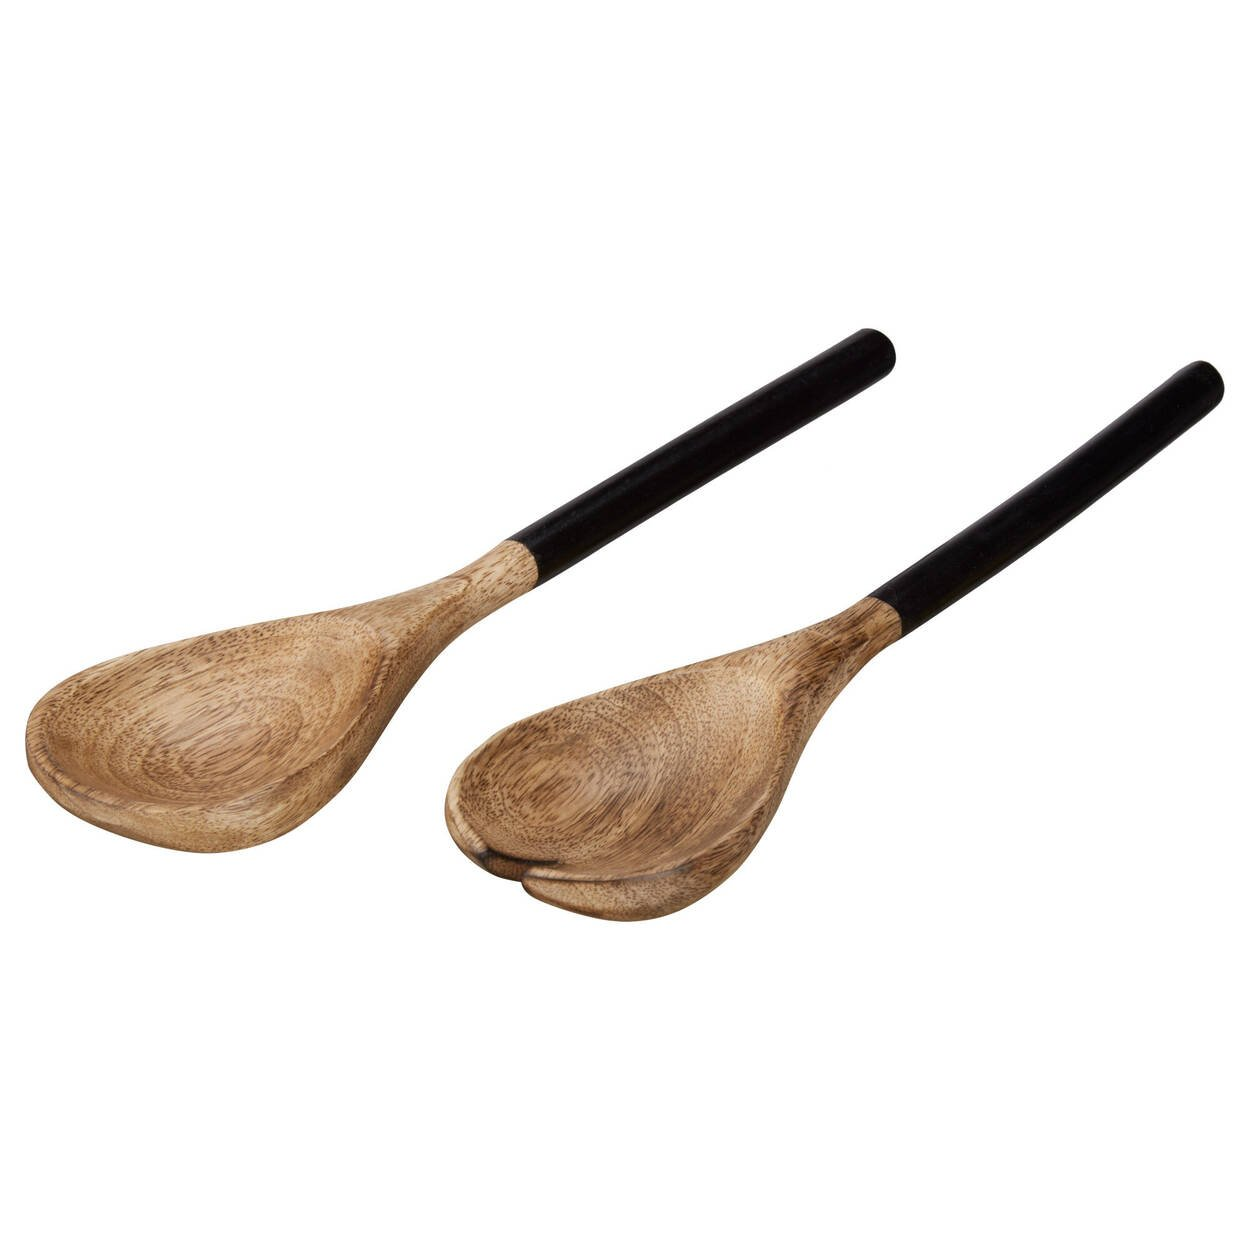 Set of 2 Mango Wood Service Utensils